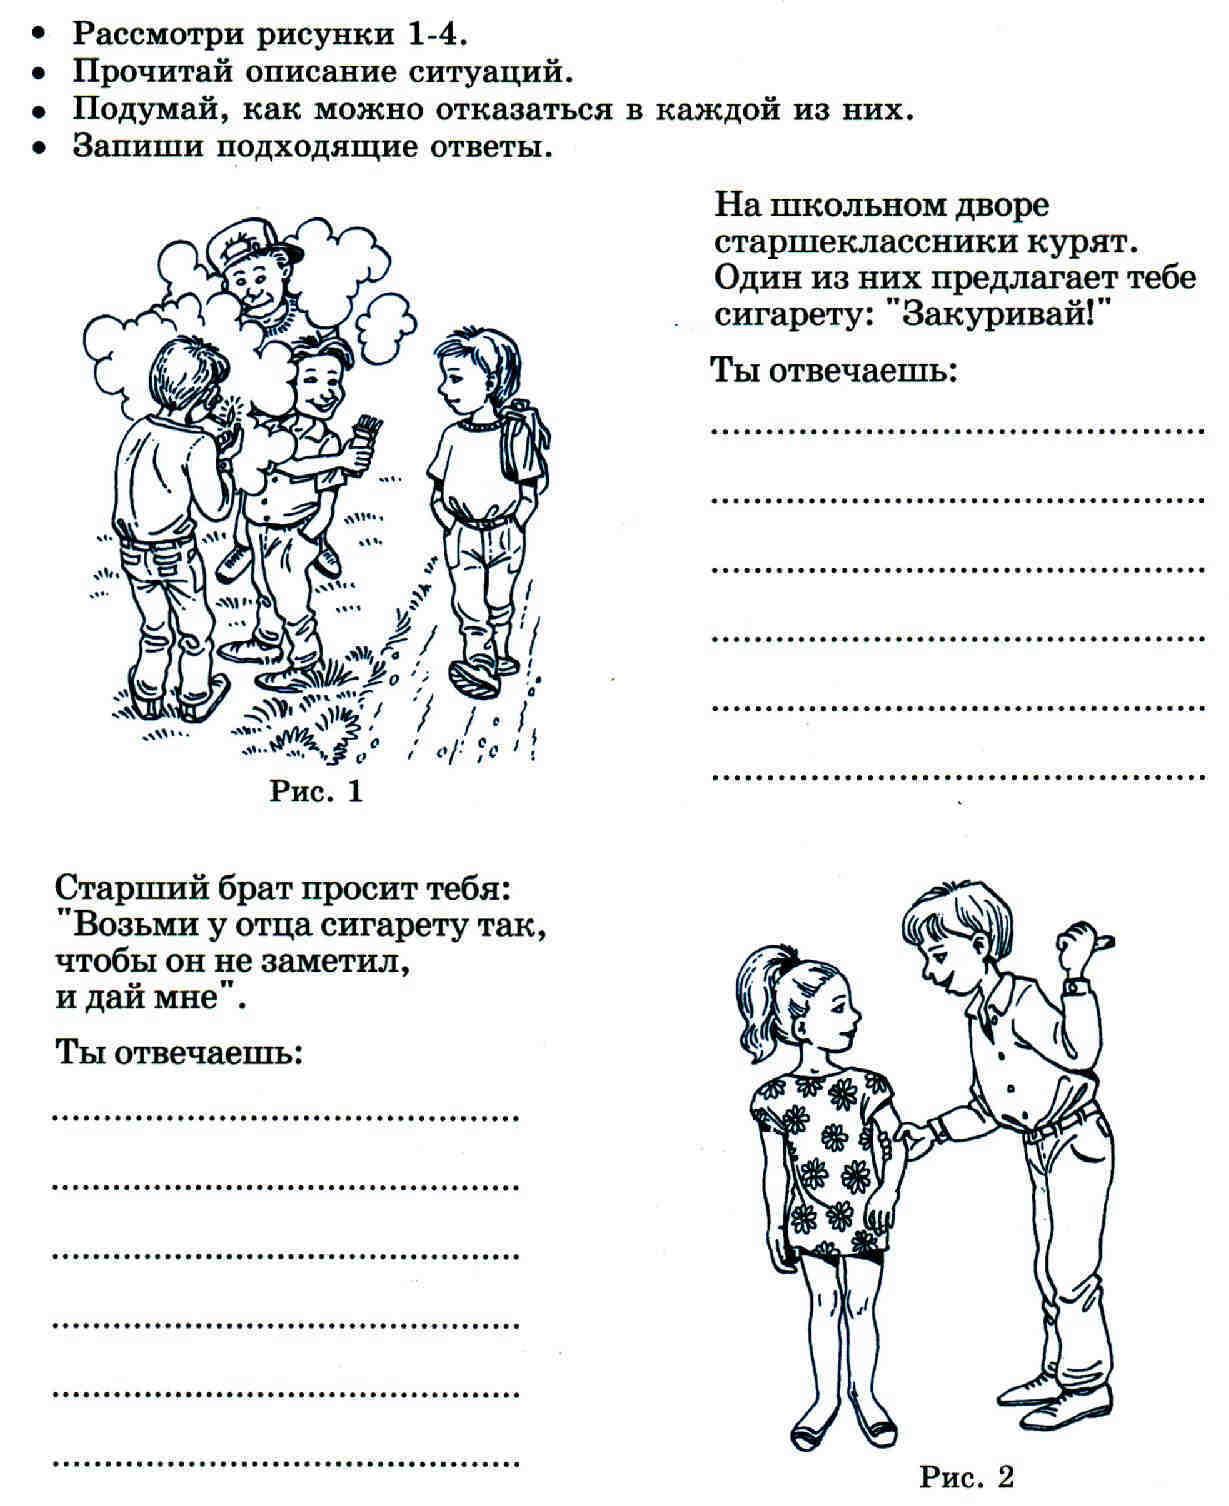 http://school10-zima.narod.ru/1.JPG